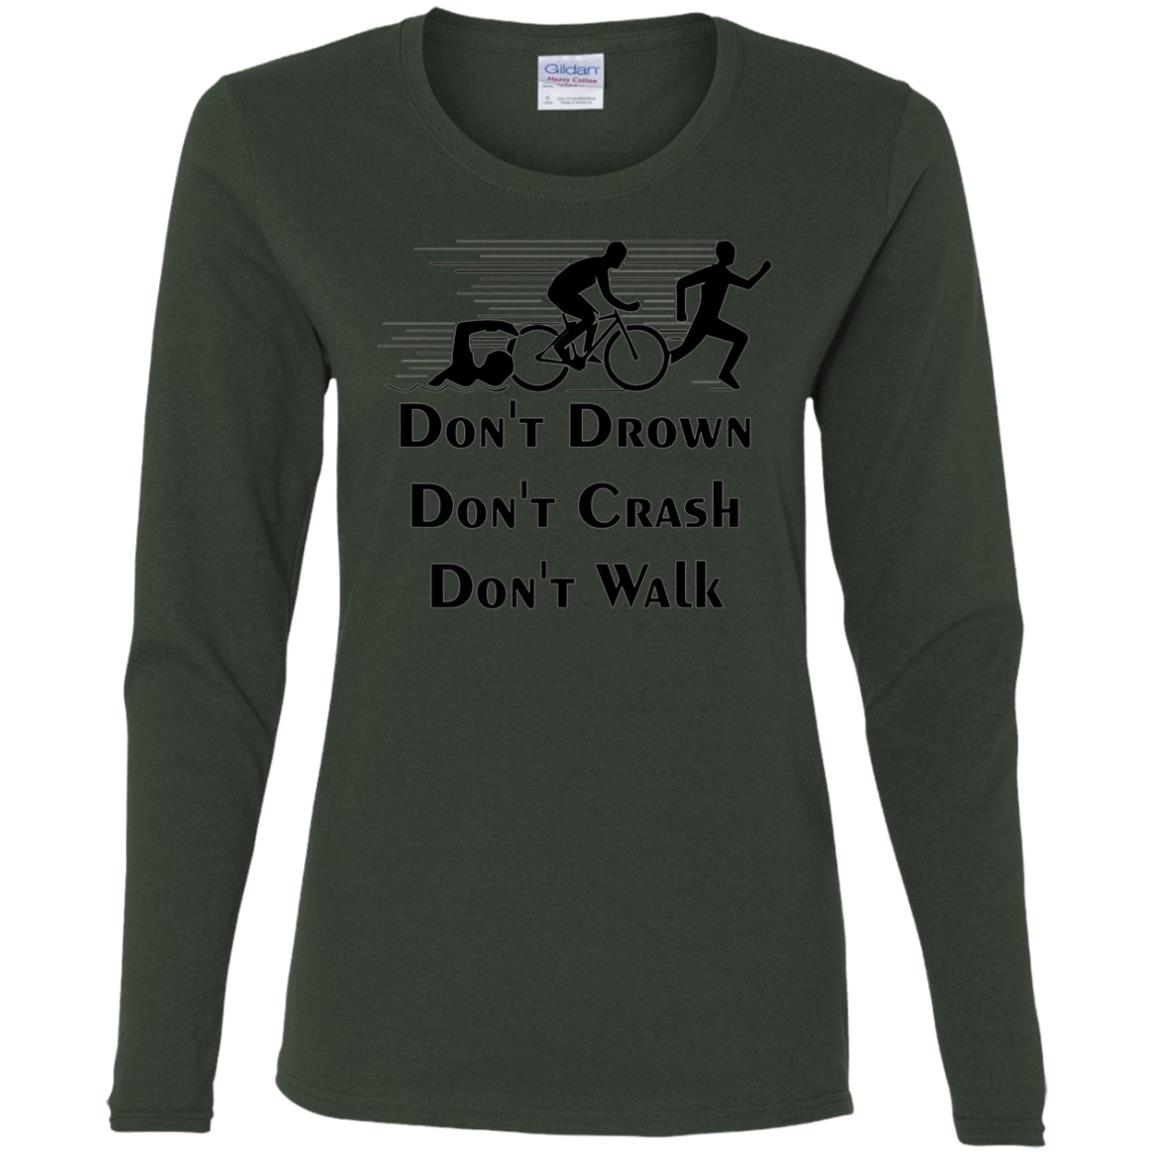 Don't Drown Don't Crash Don't Walk Women Long Sleeve T-Shirt